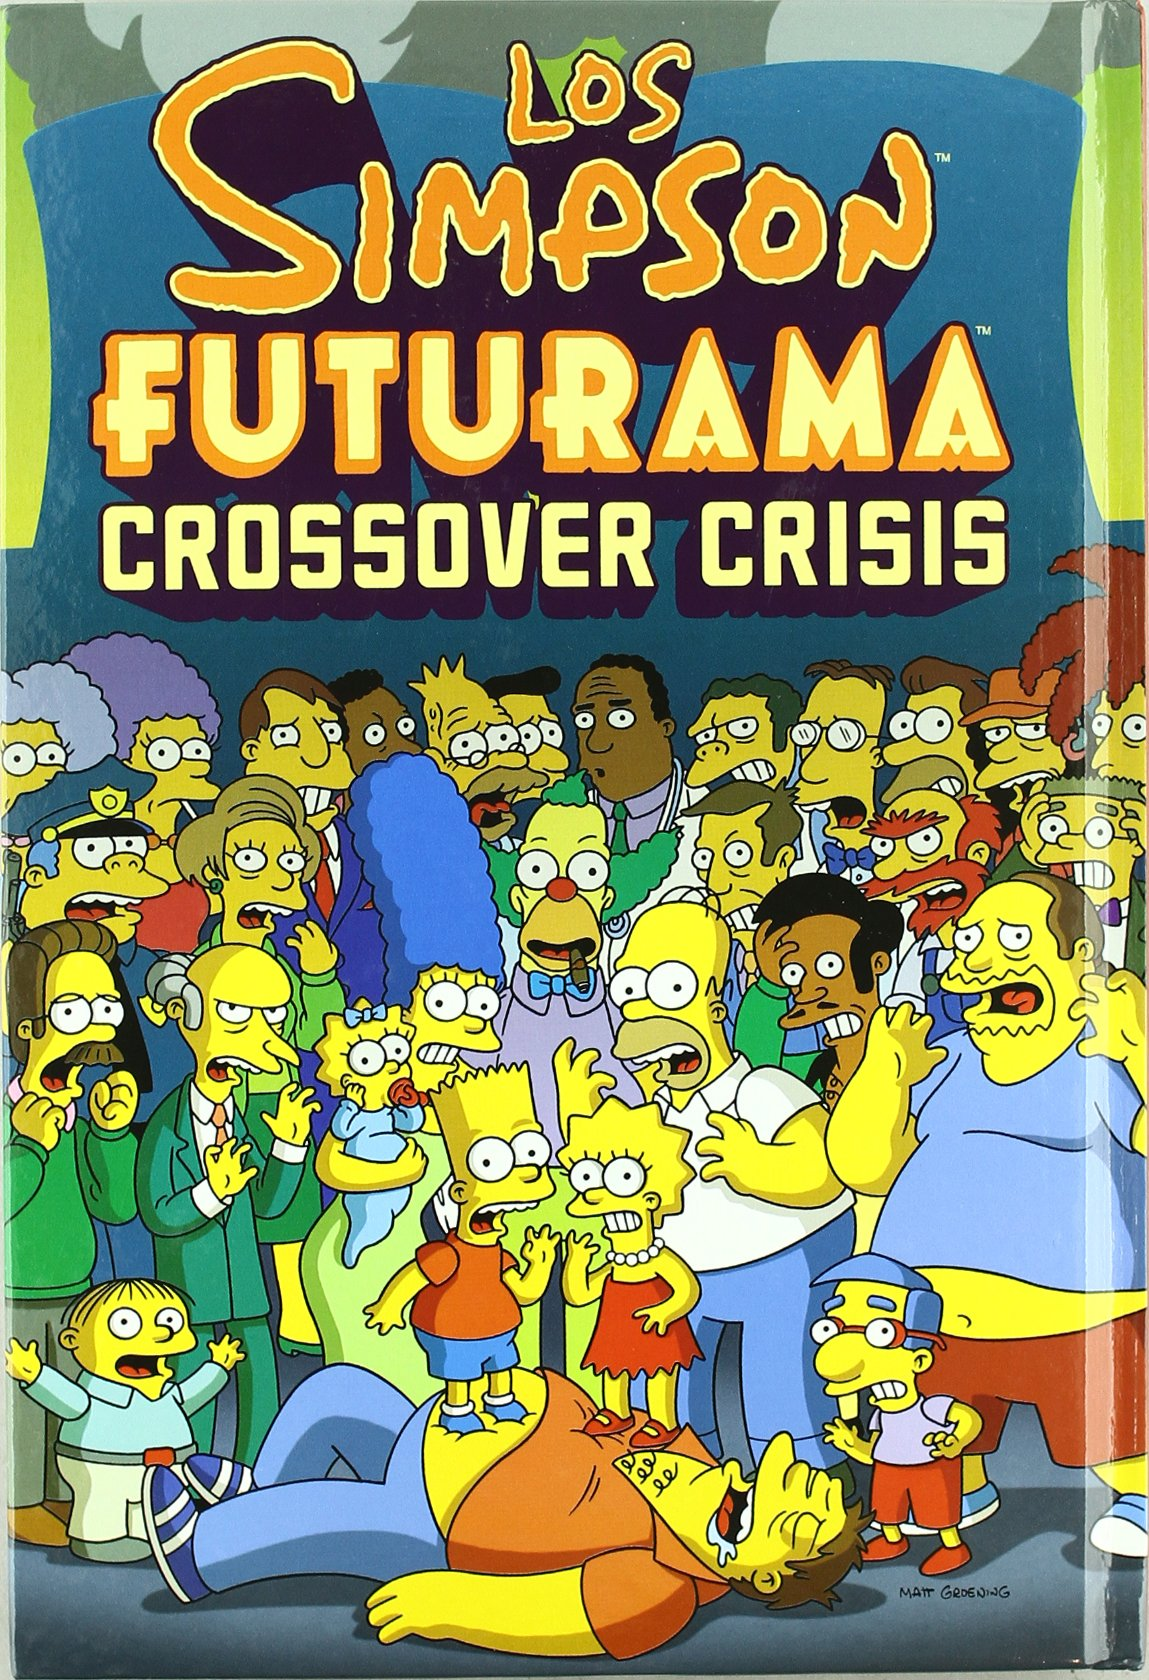 LOS SIMPSON FUTURAMA. CROSSOVER CRISIS: MATT GROENING ...